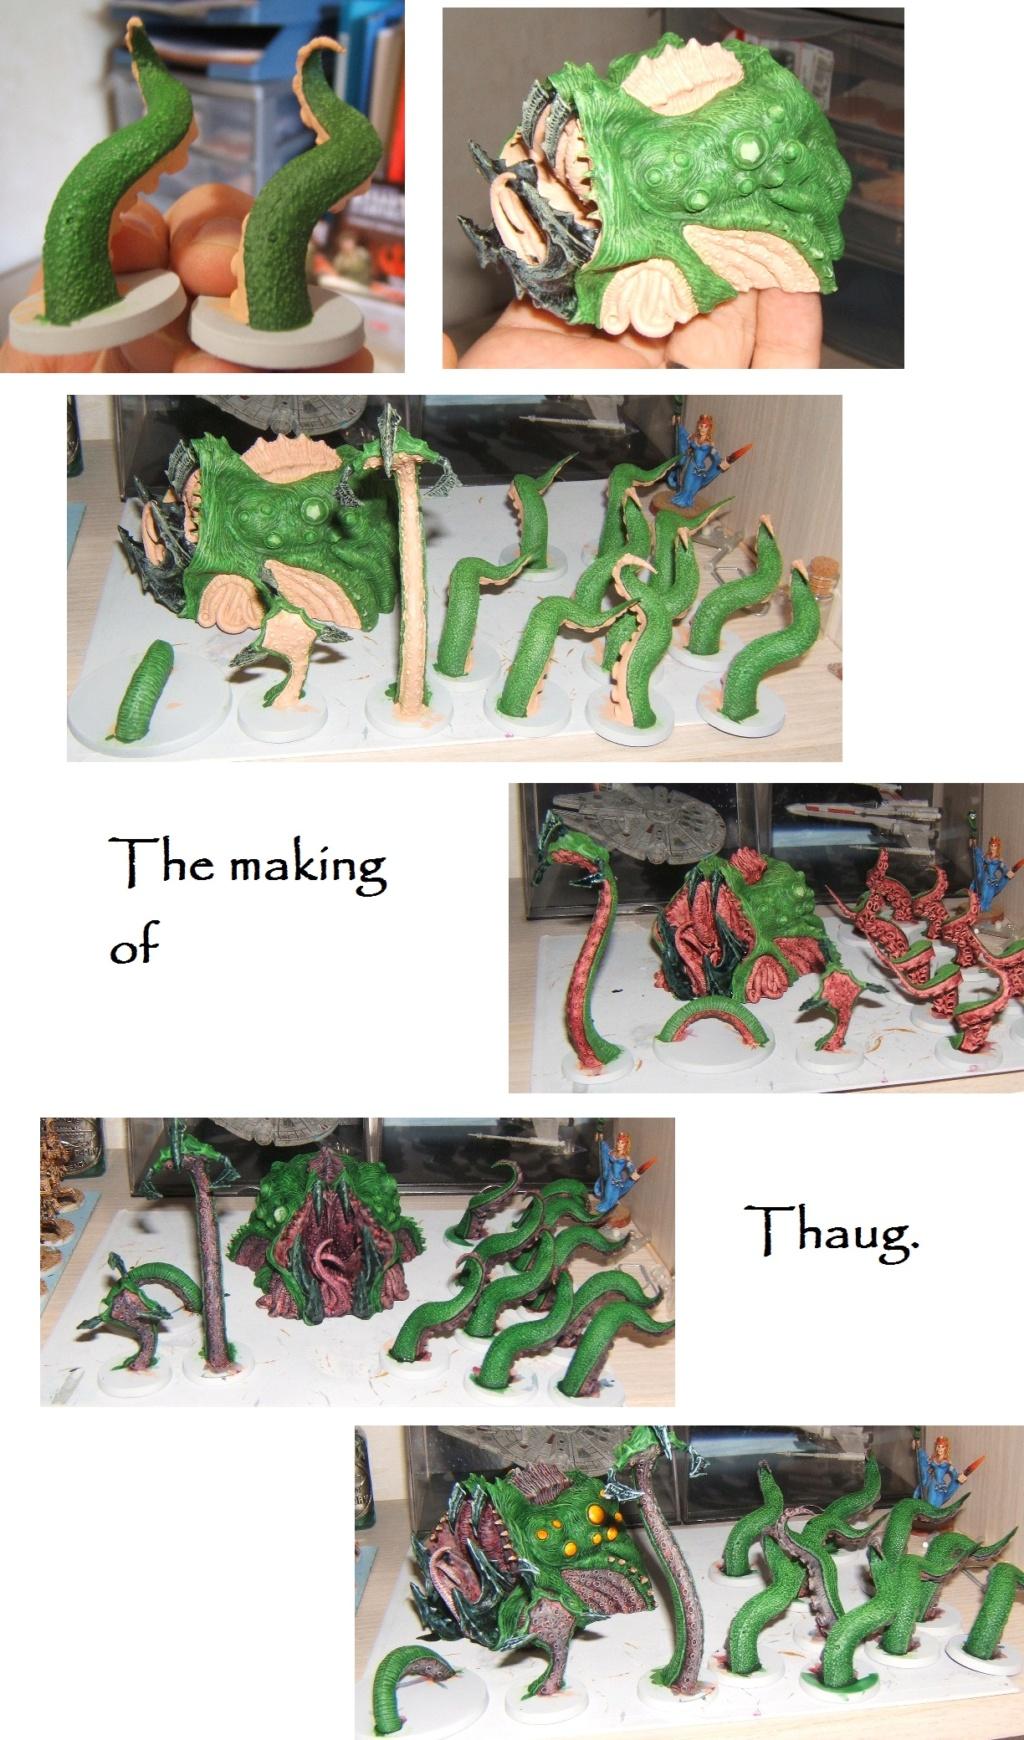 Ma version du Conan de Monolith - Page 3 Making10